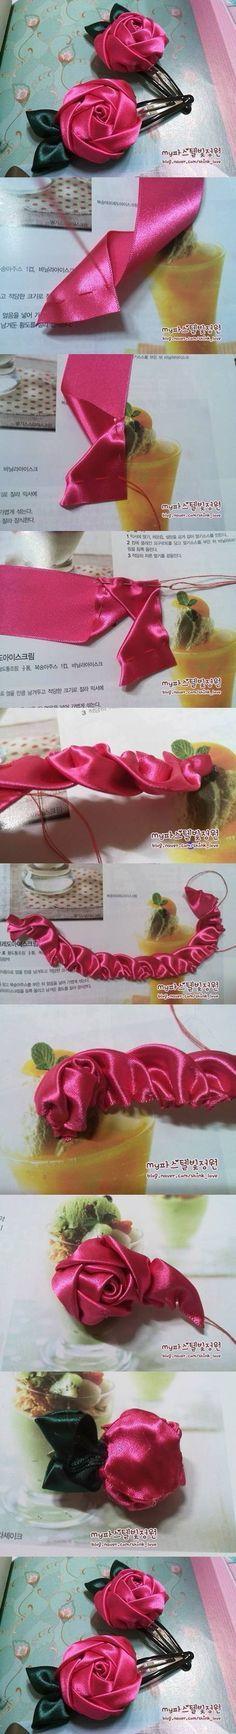 DIY Rose of Organza Ribbon DIY Rose of Organza Ribbon by diyforever